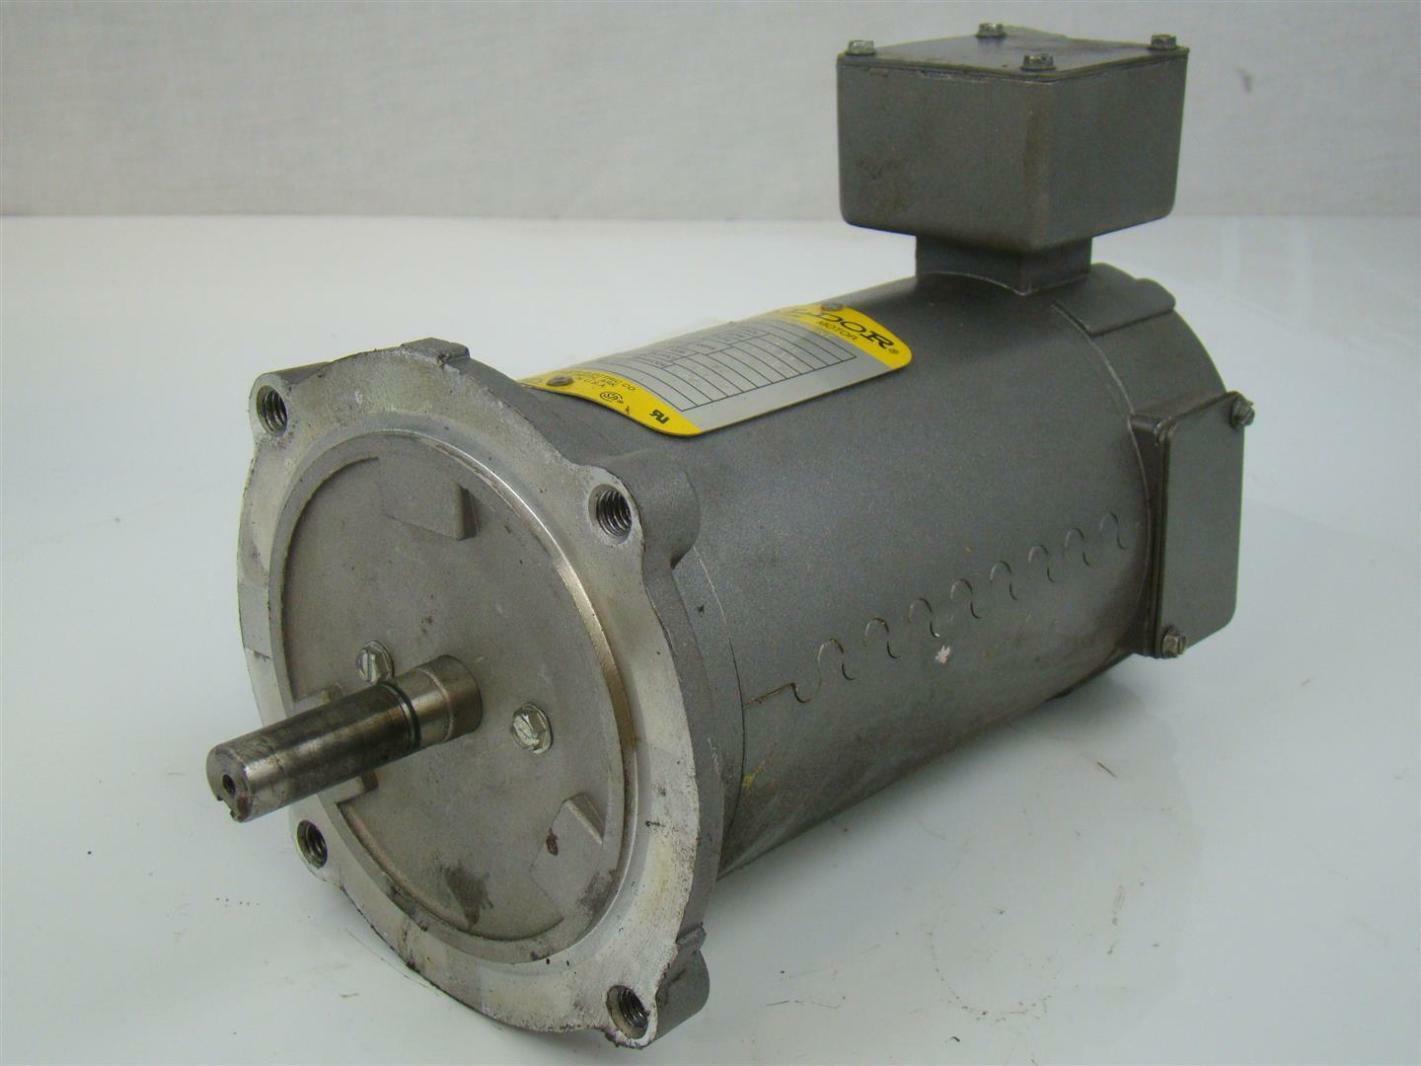 Baldor Industrial Dc Motor 25hp 1750rpm 2 5a Gdp3310